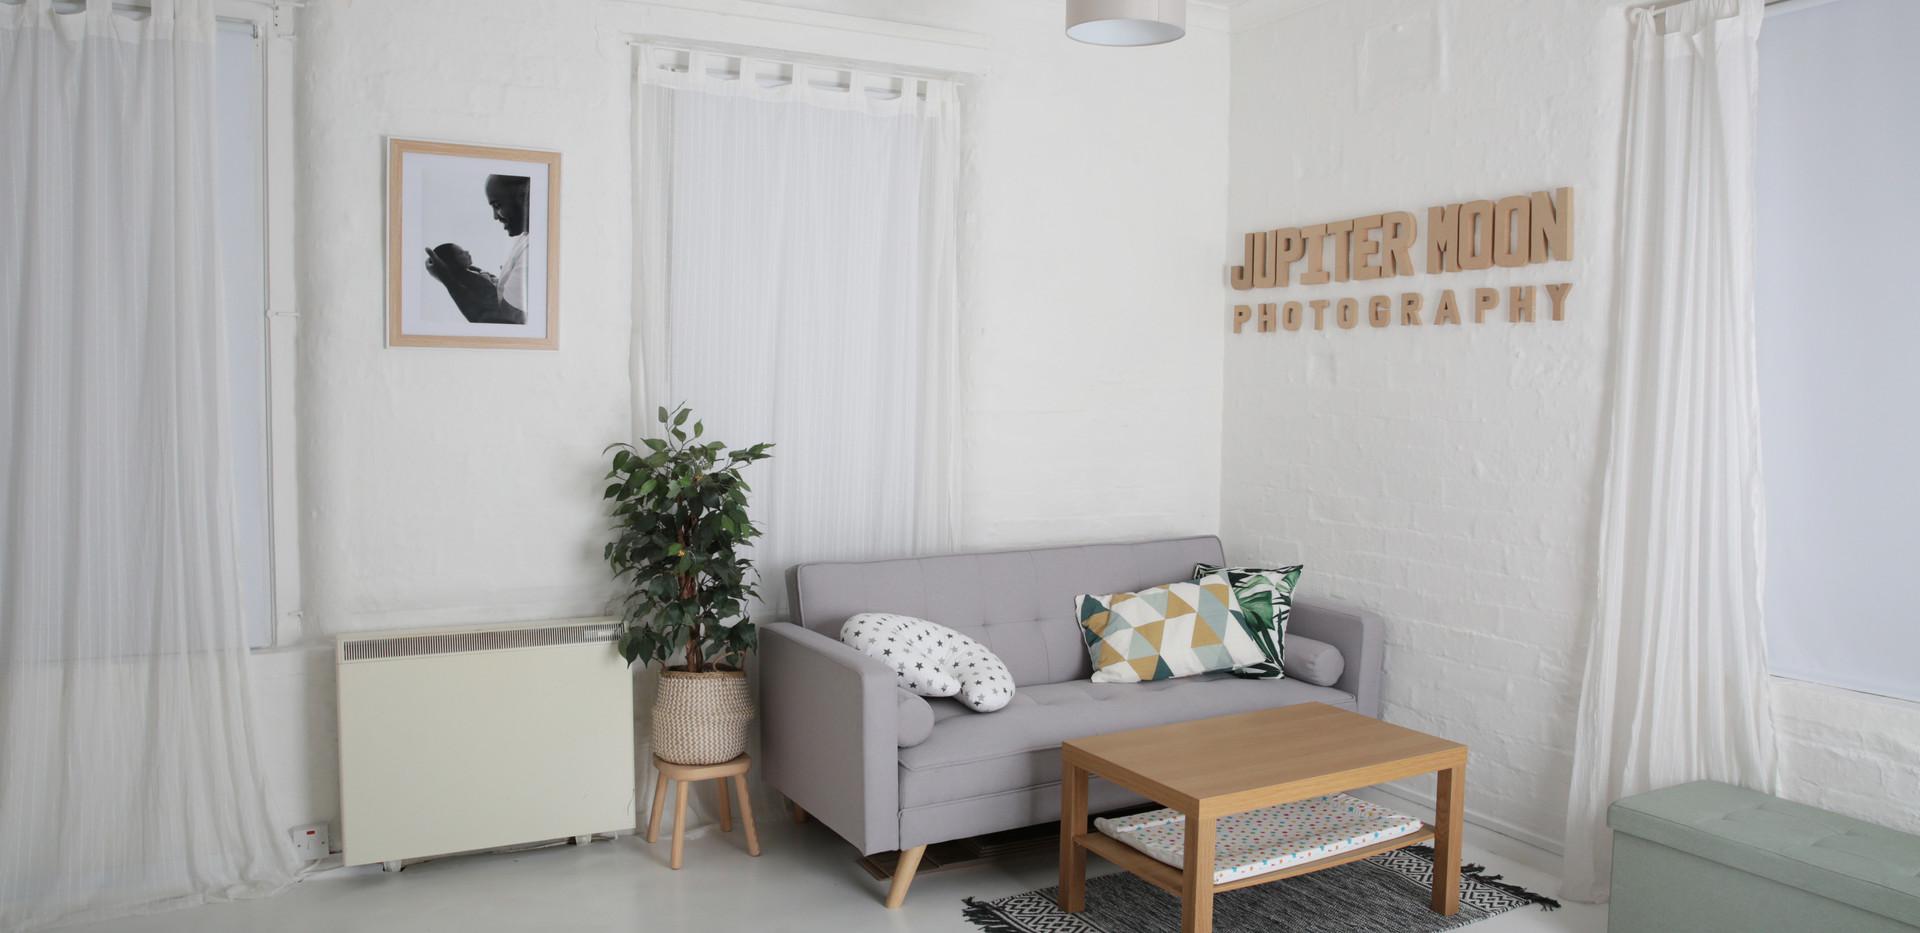 Studio Room at Jupiter Moon Photography